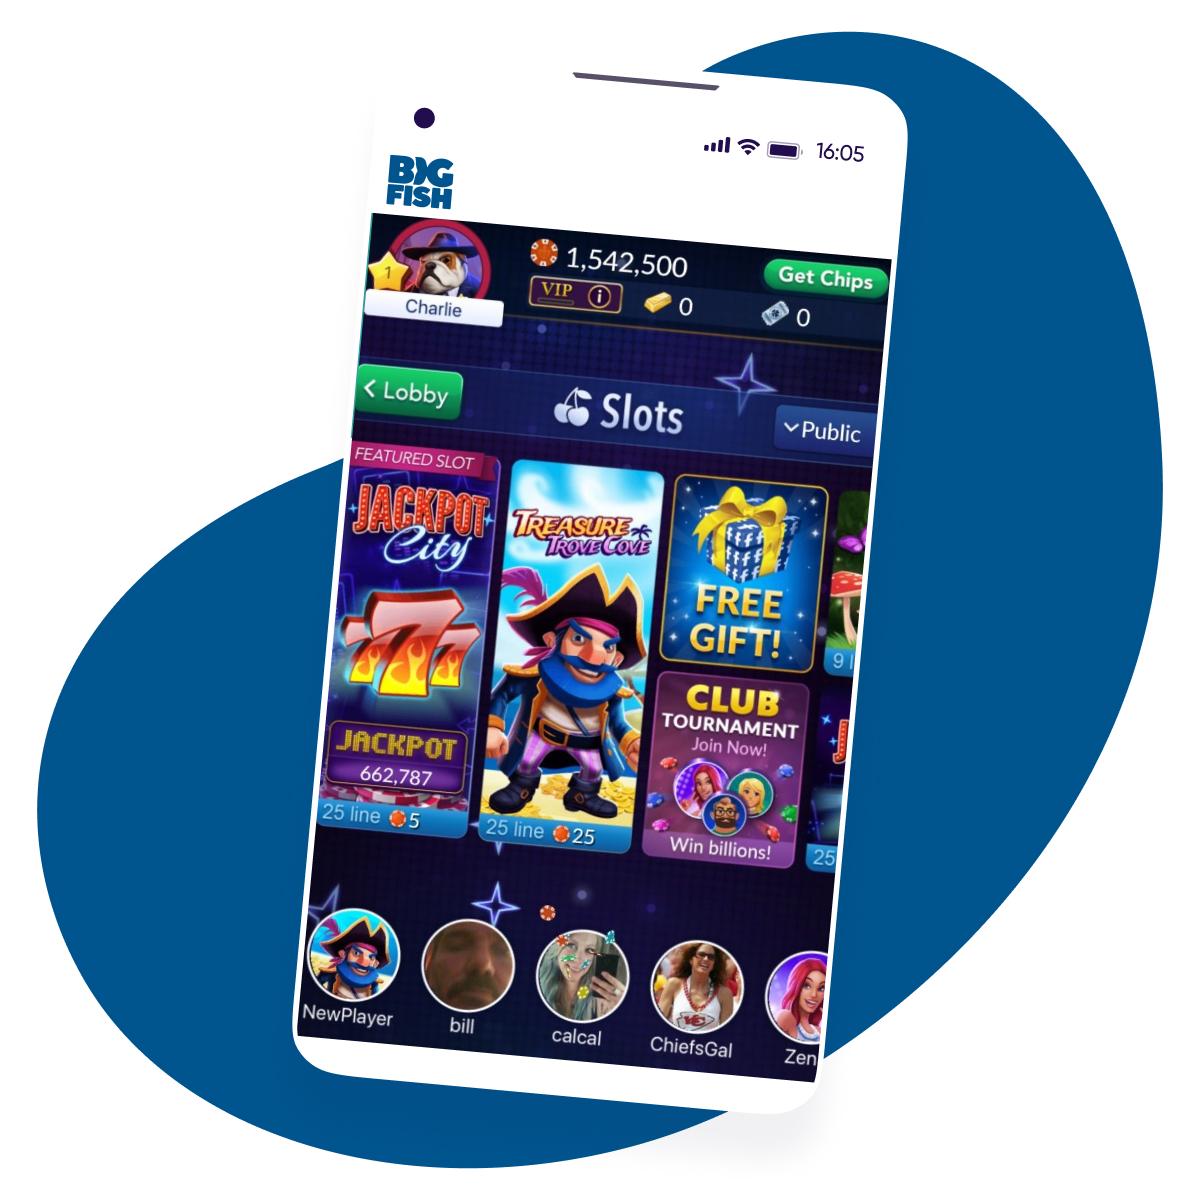 Big Fish AppsFlyer Customer